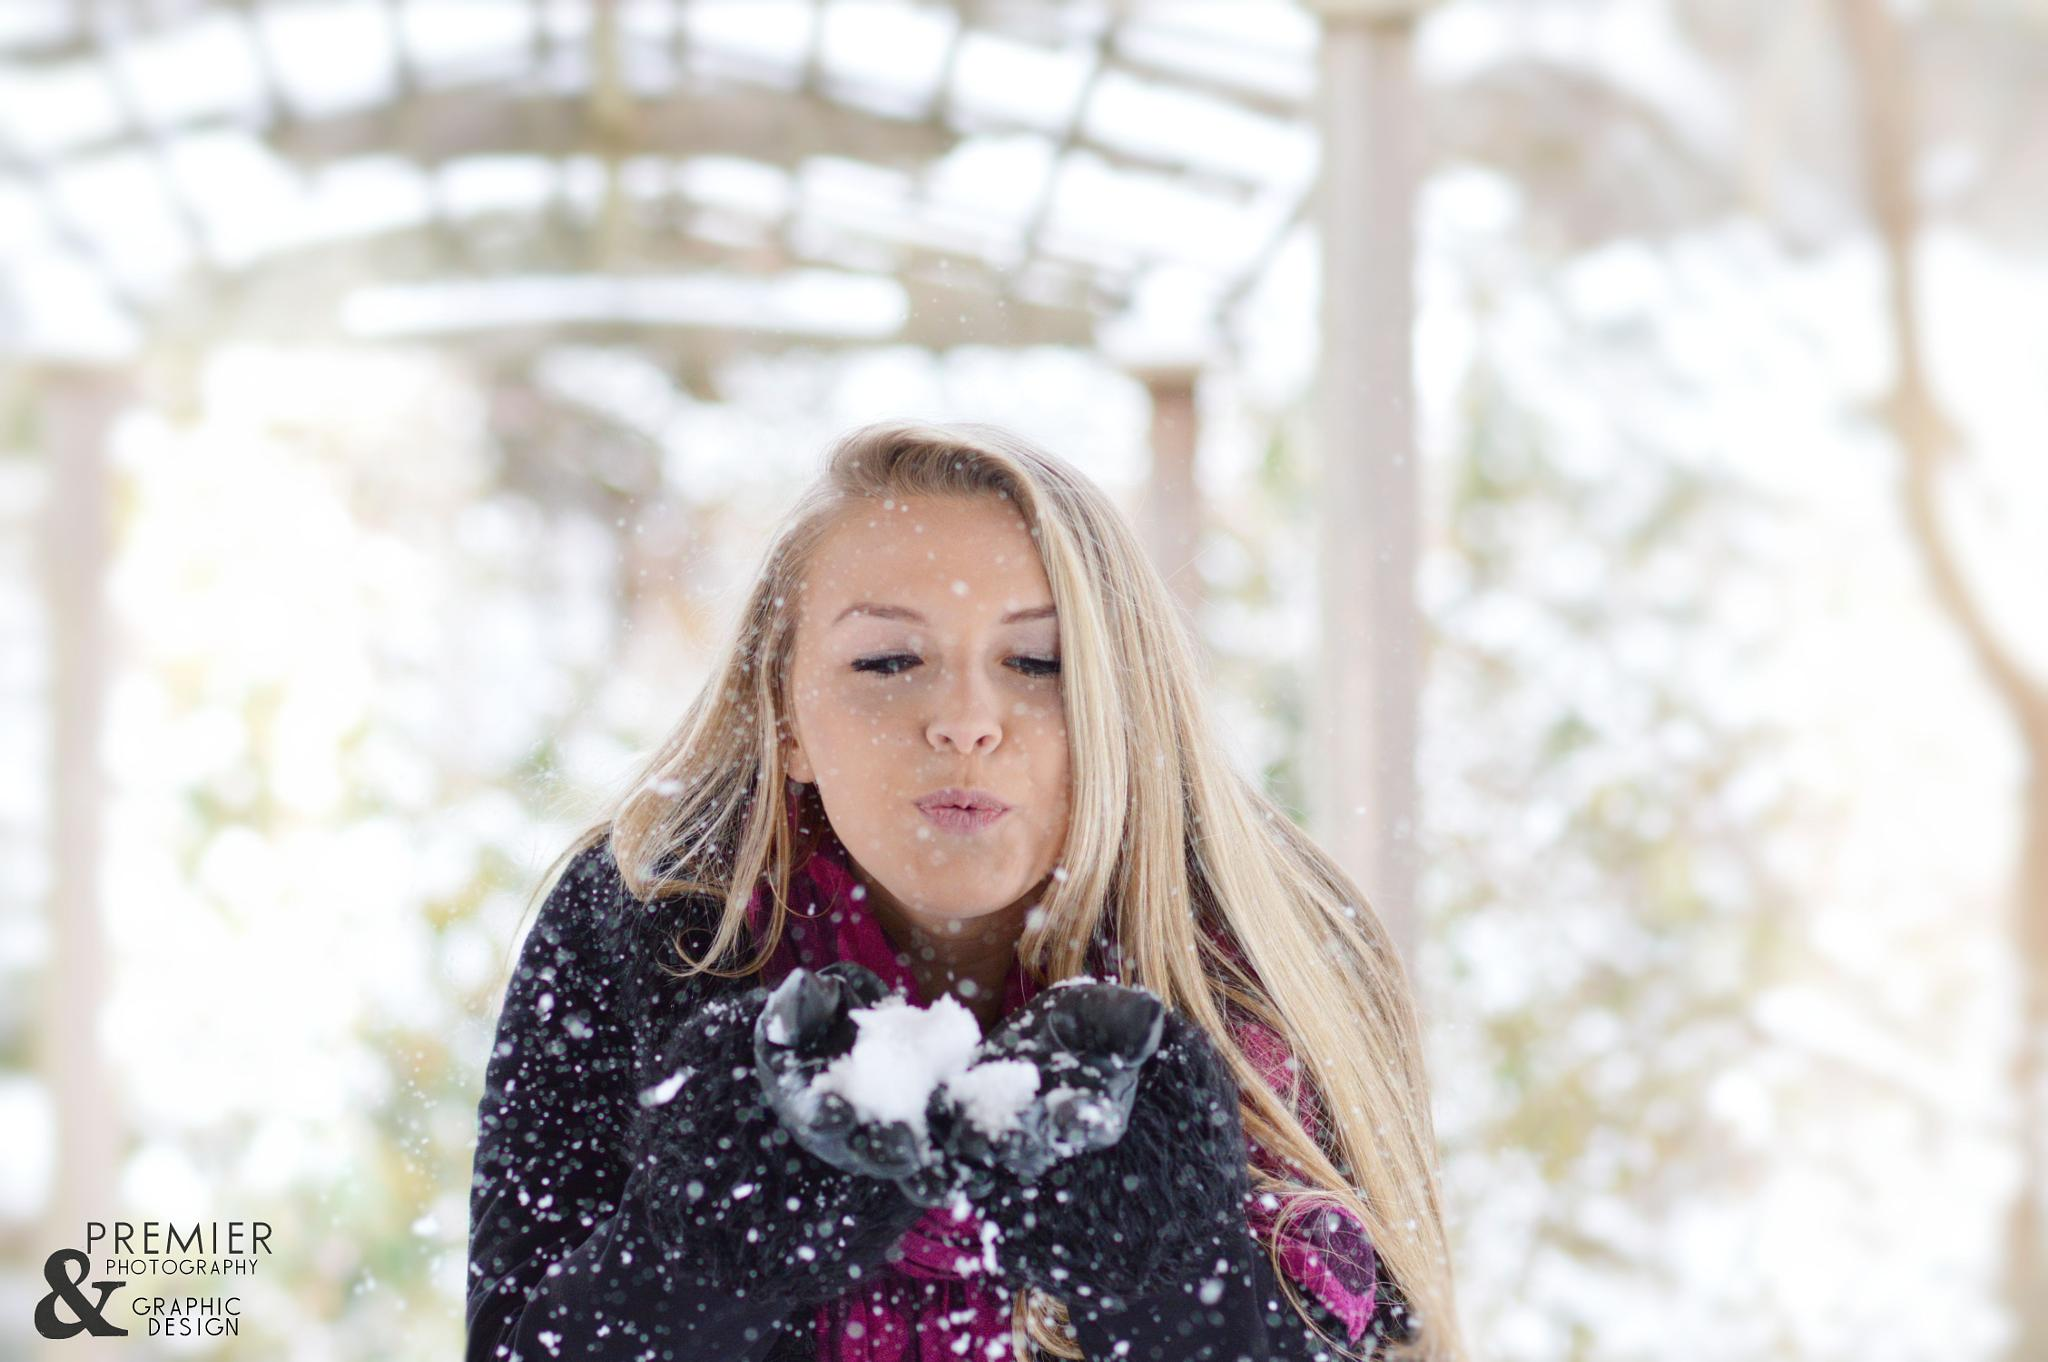 A little snow never hurt  by PremierPhotography